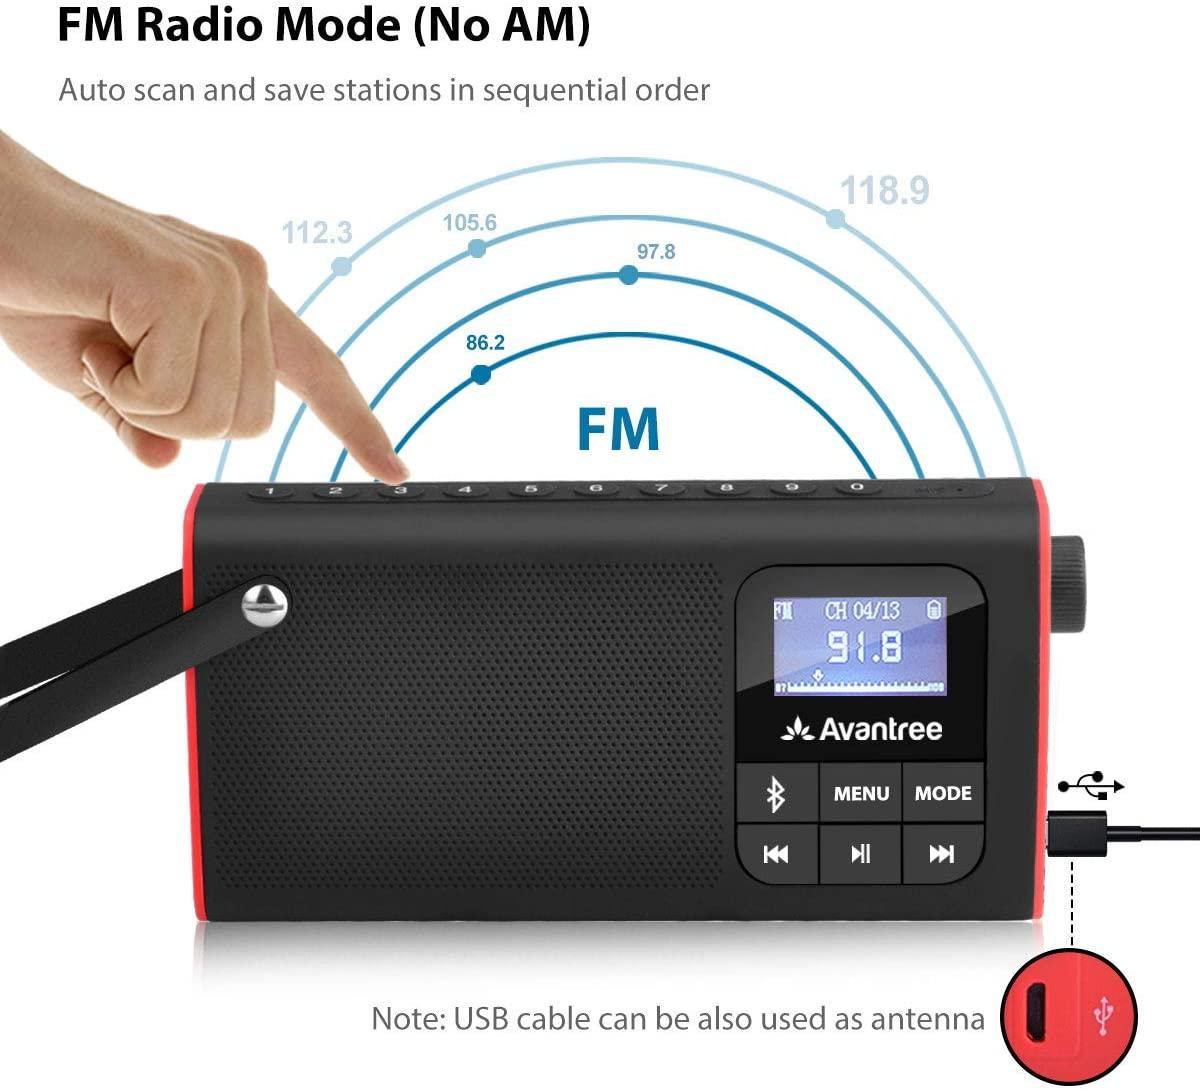 Avantree radio fm lecteur audio micro sd 1